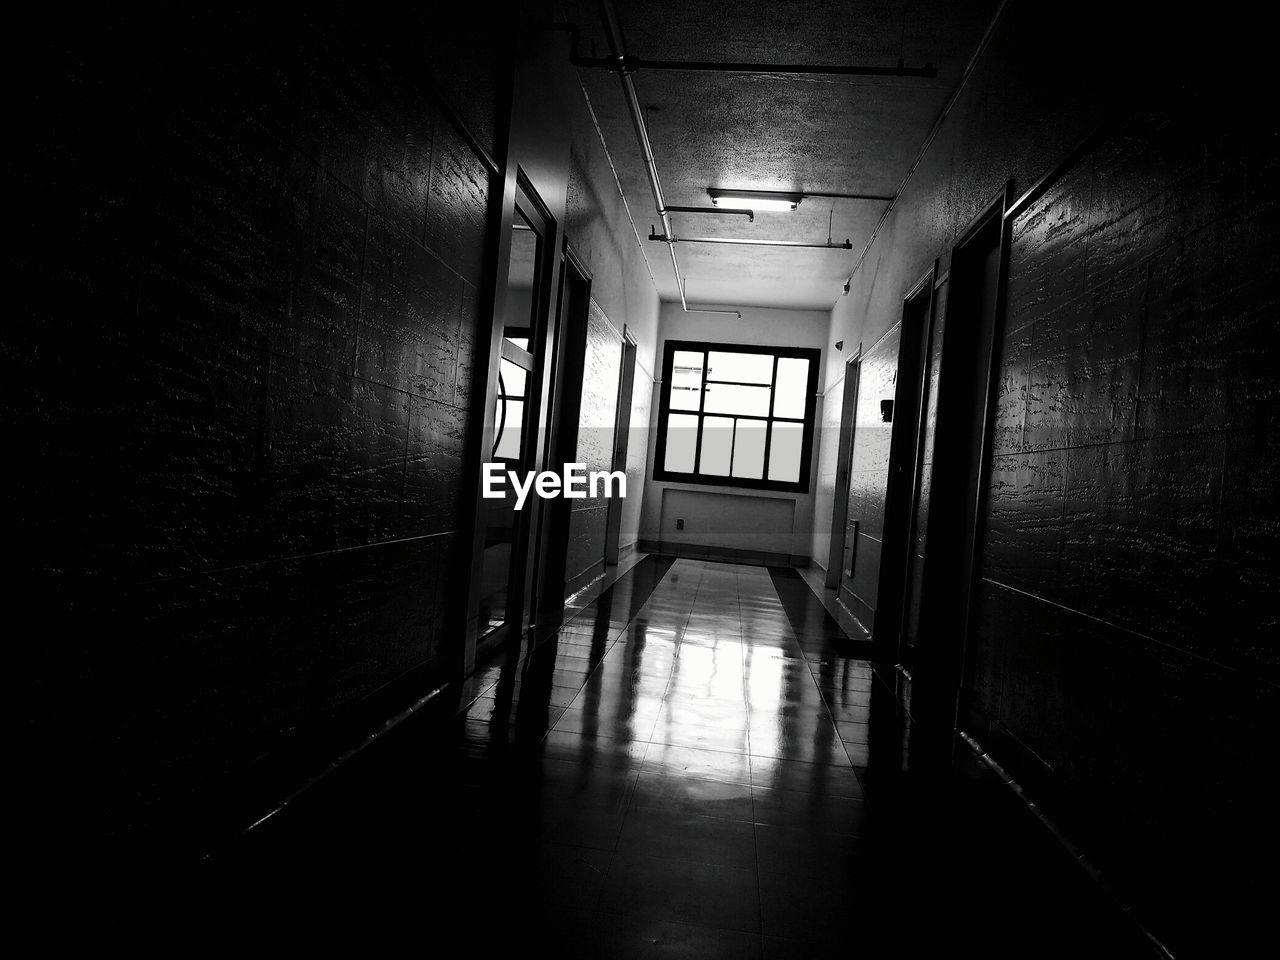 corridor, indoors, empty, flooring, door, the way forward, no people, hospital, architecture, daylight, day